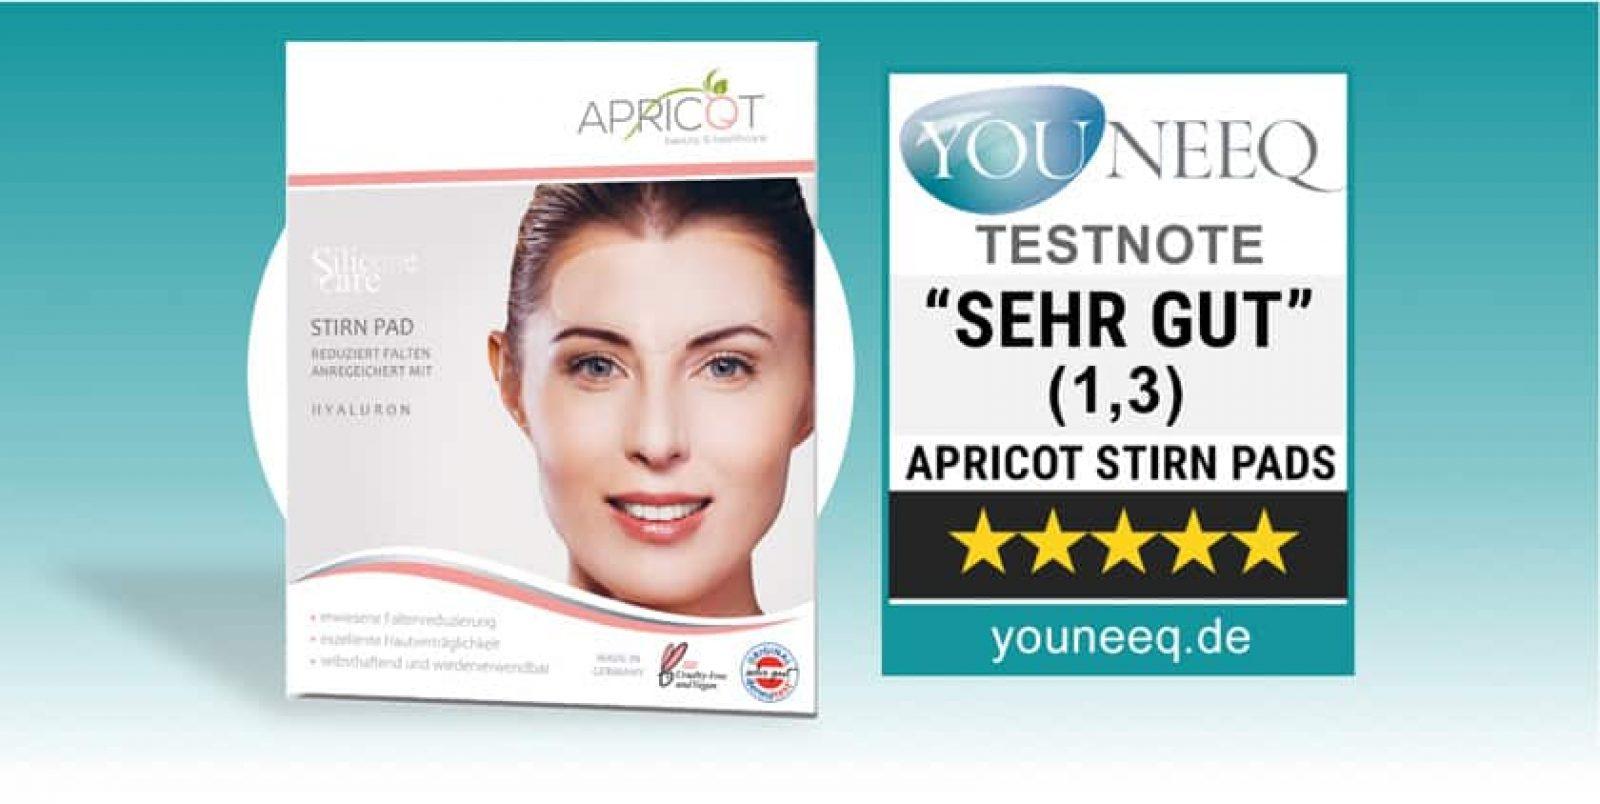 Apricot Stirn Pads Test Youneeq